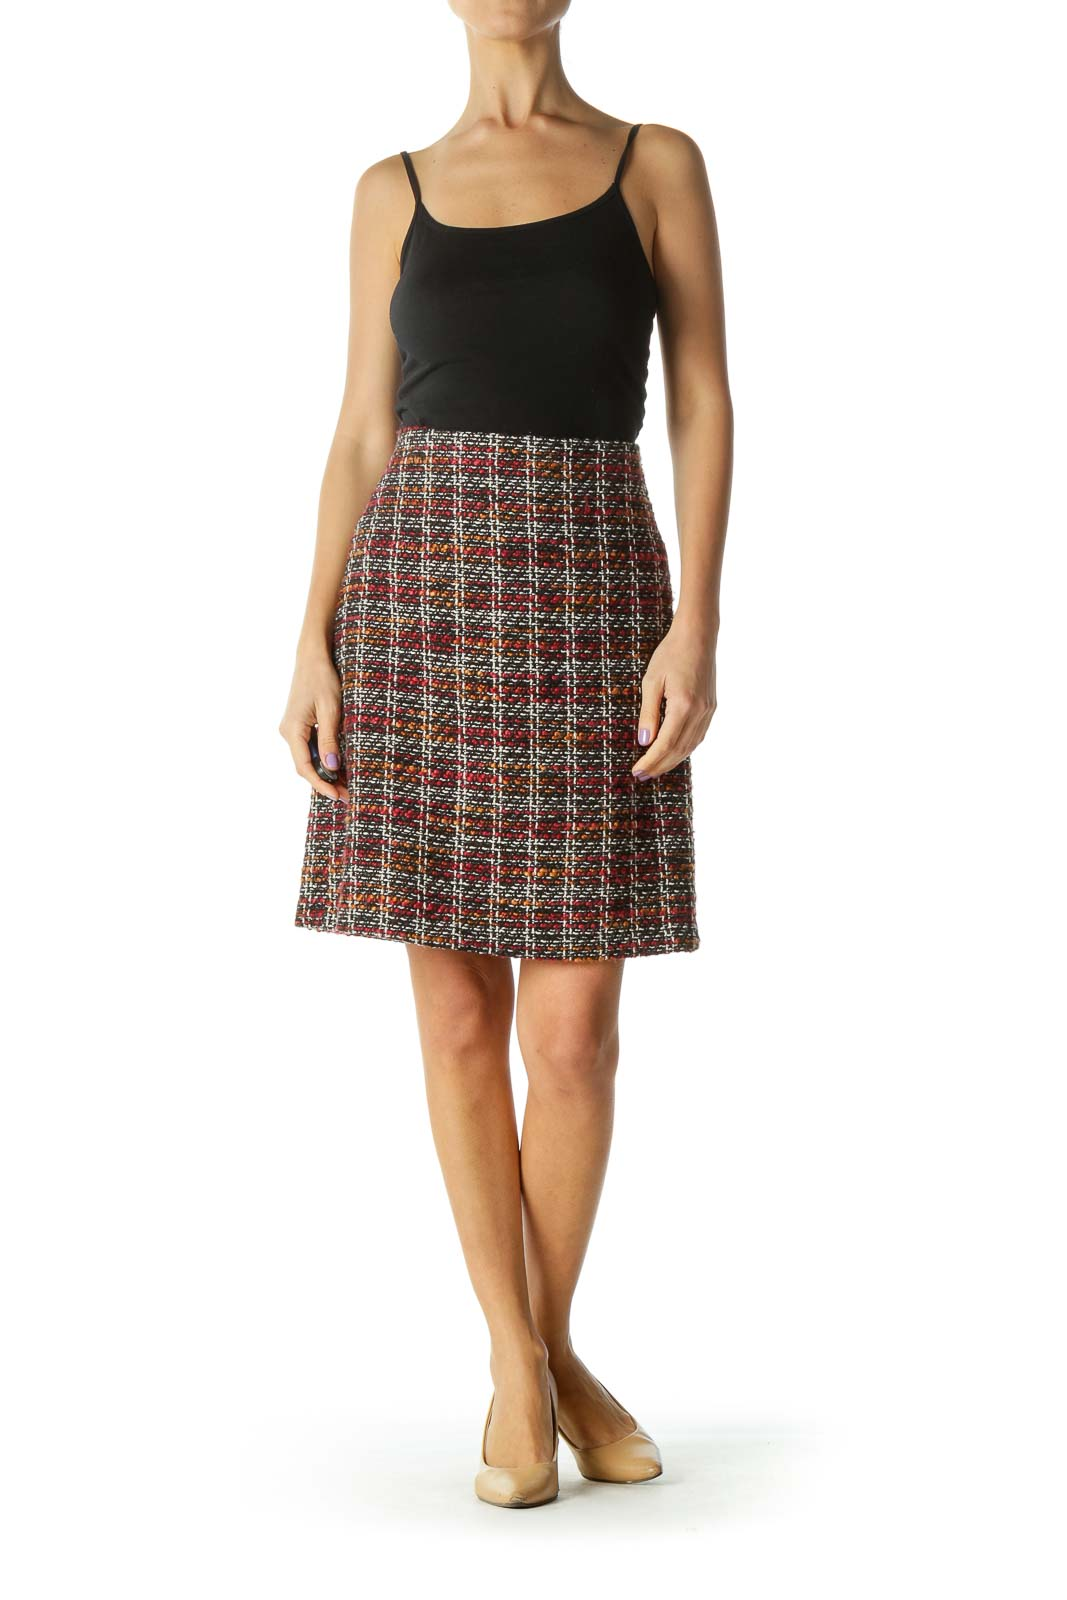 Black Red Knit Pencil Skirt